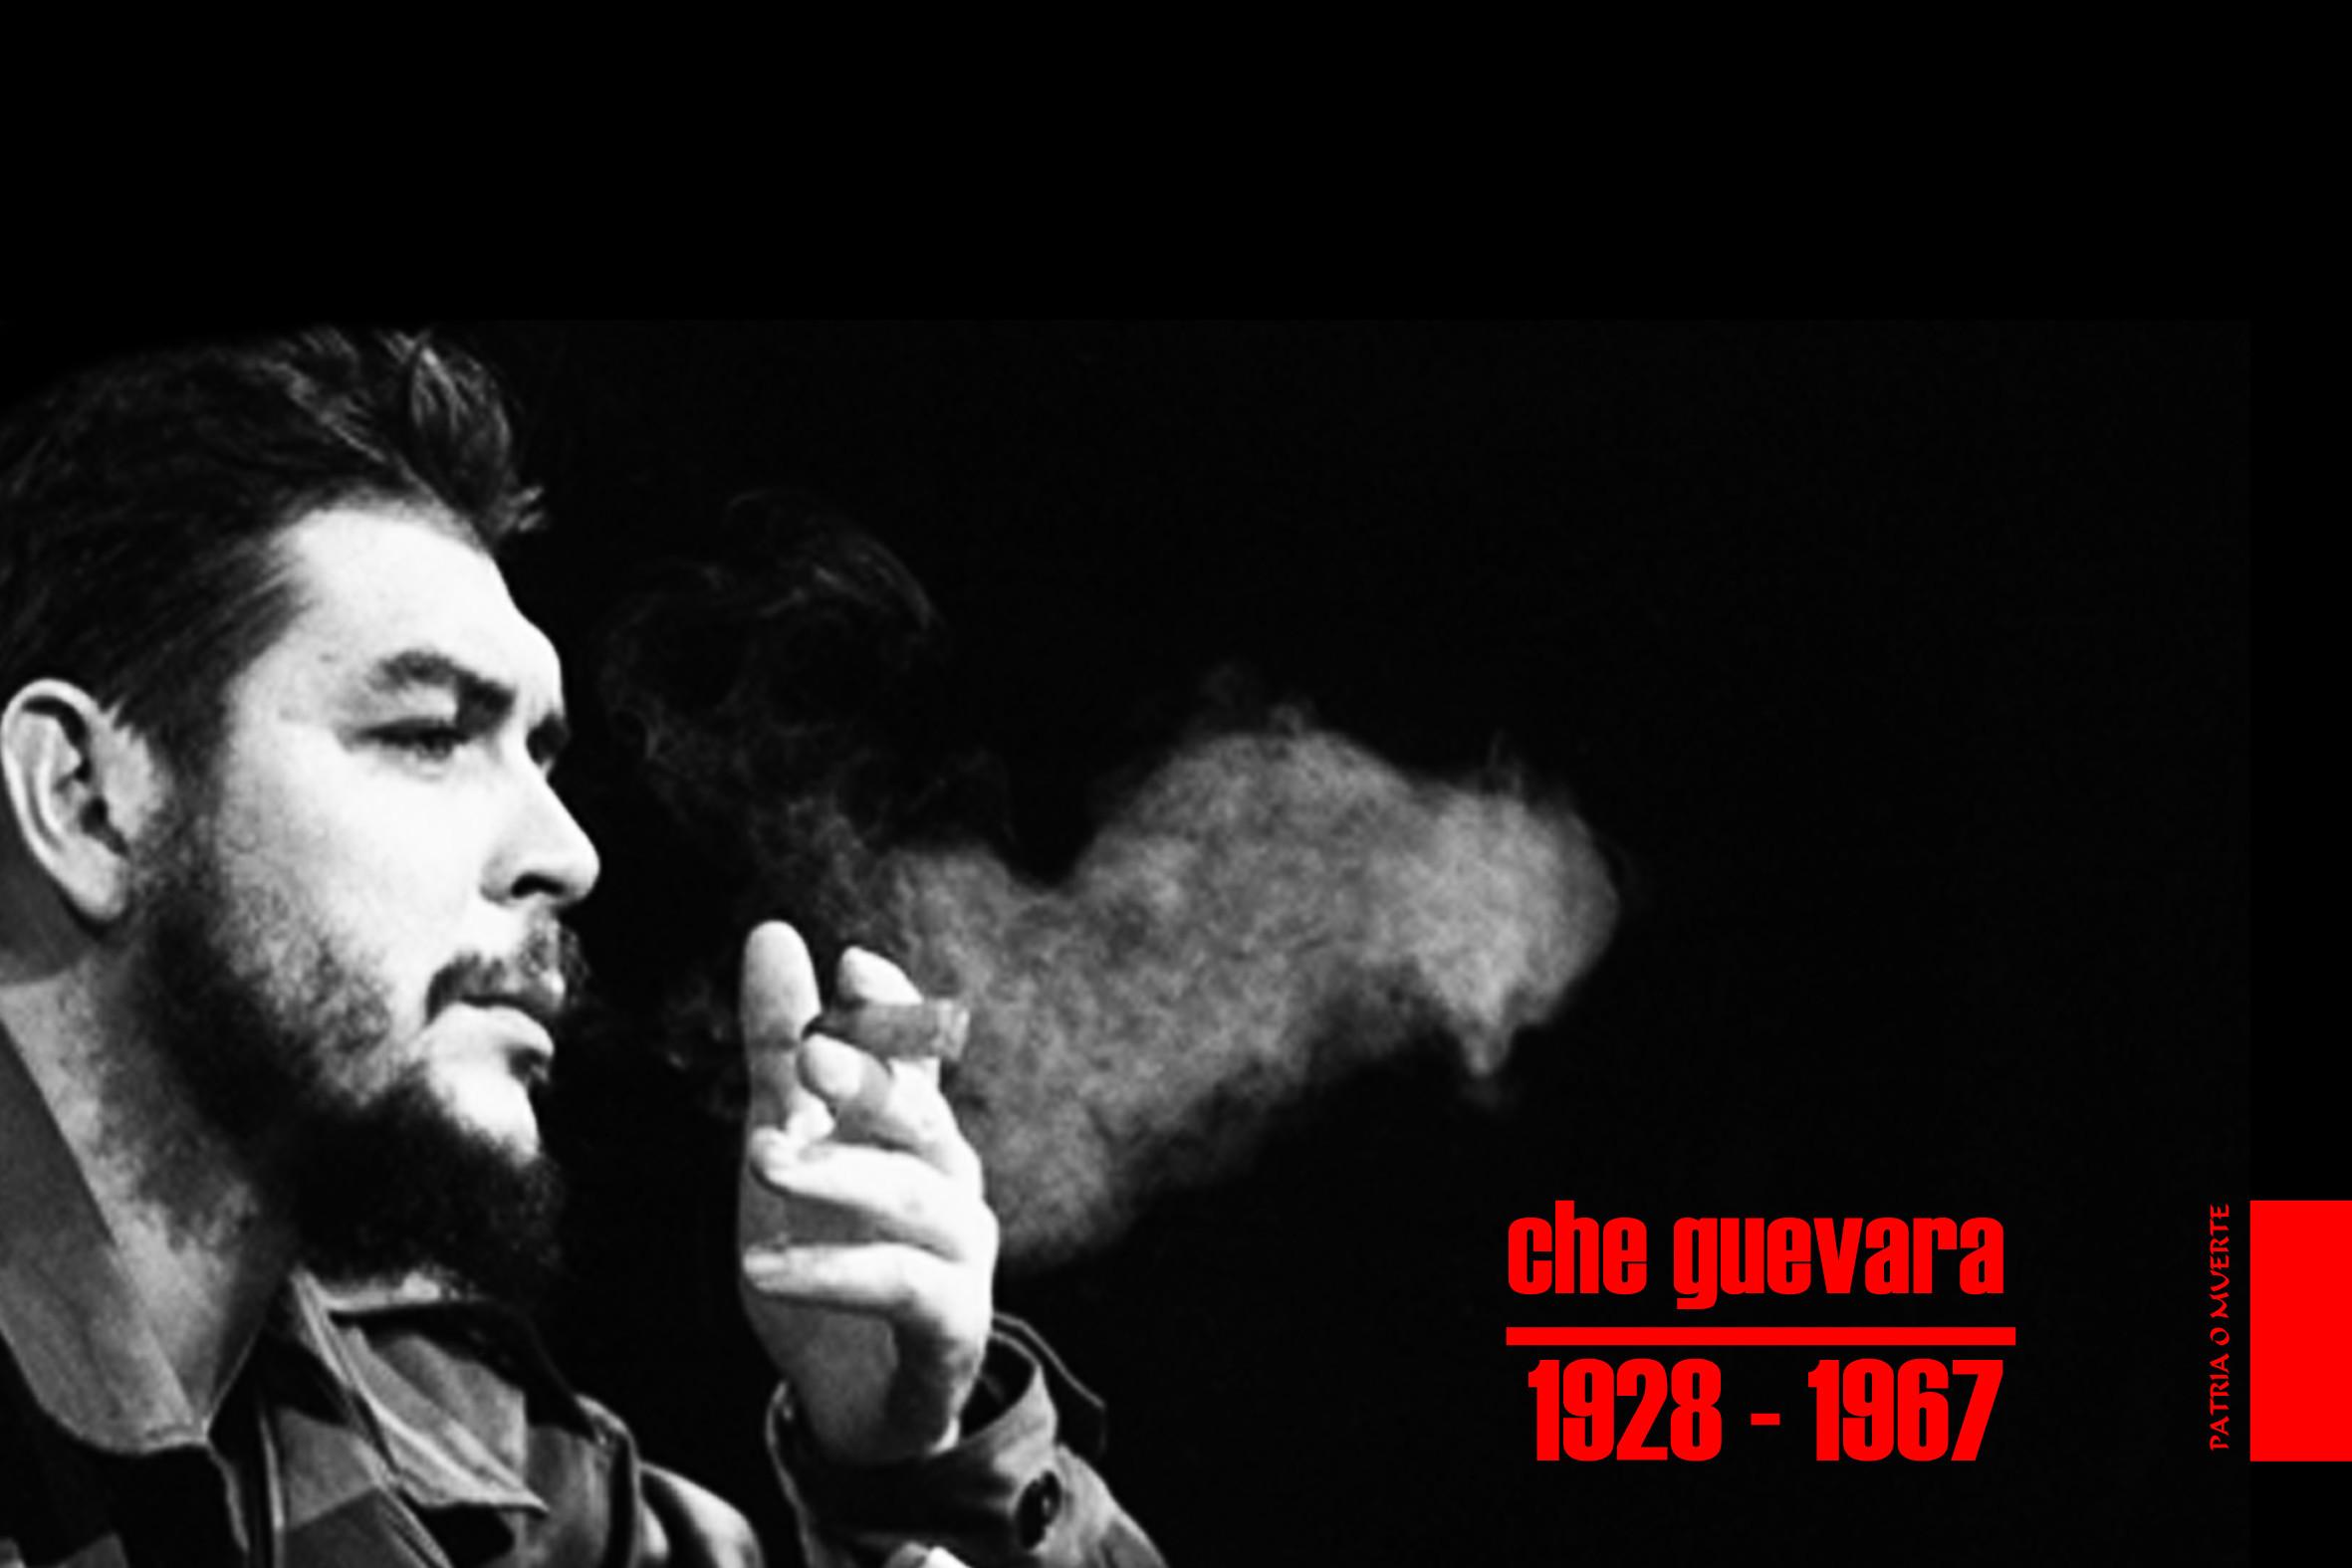 <b>Che</b> Guevara by rogaziano on DeviantArt